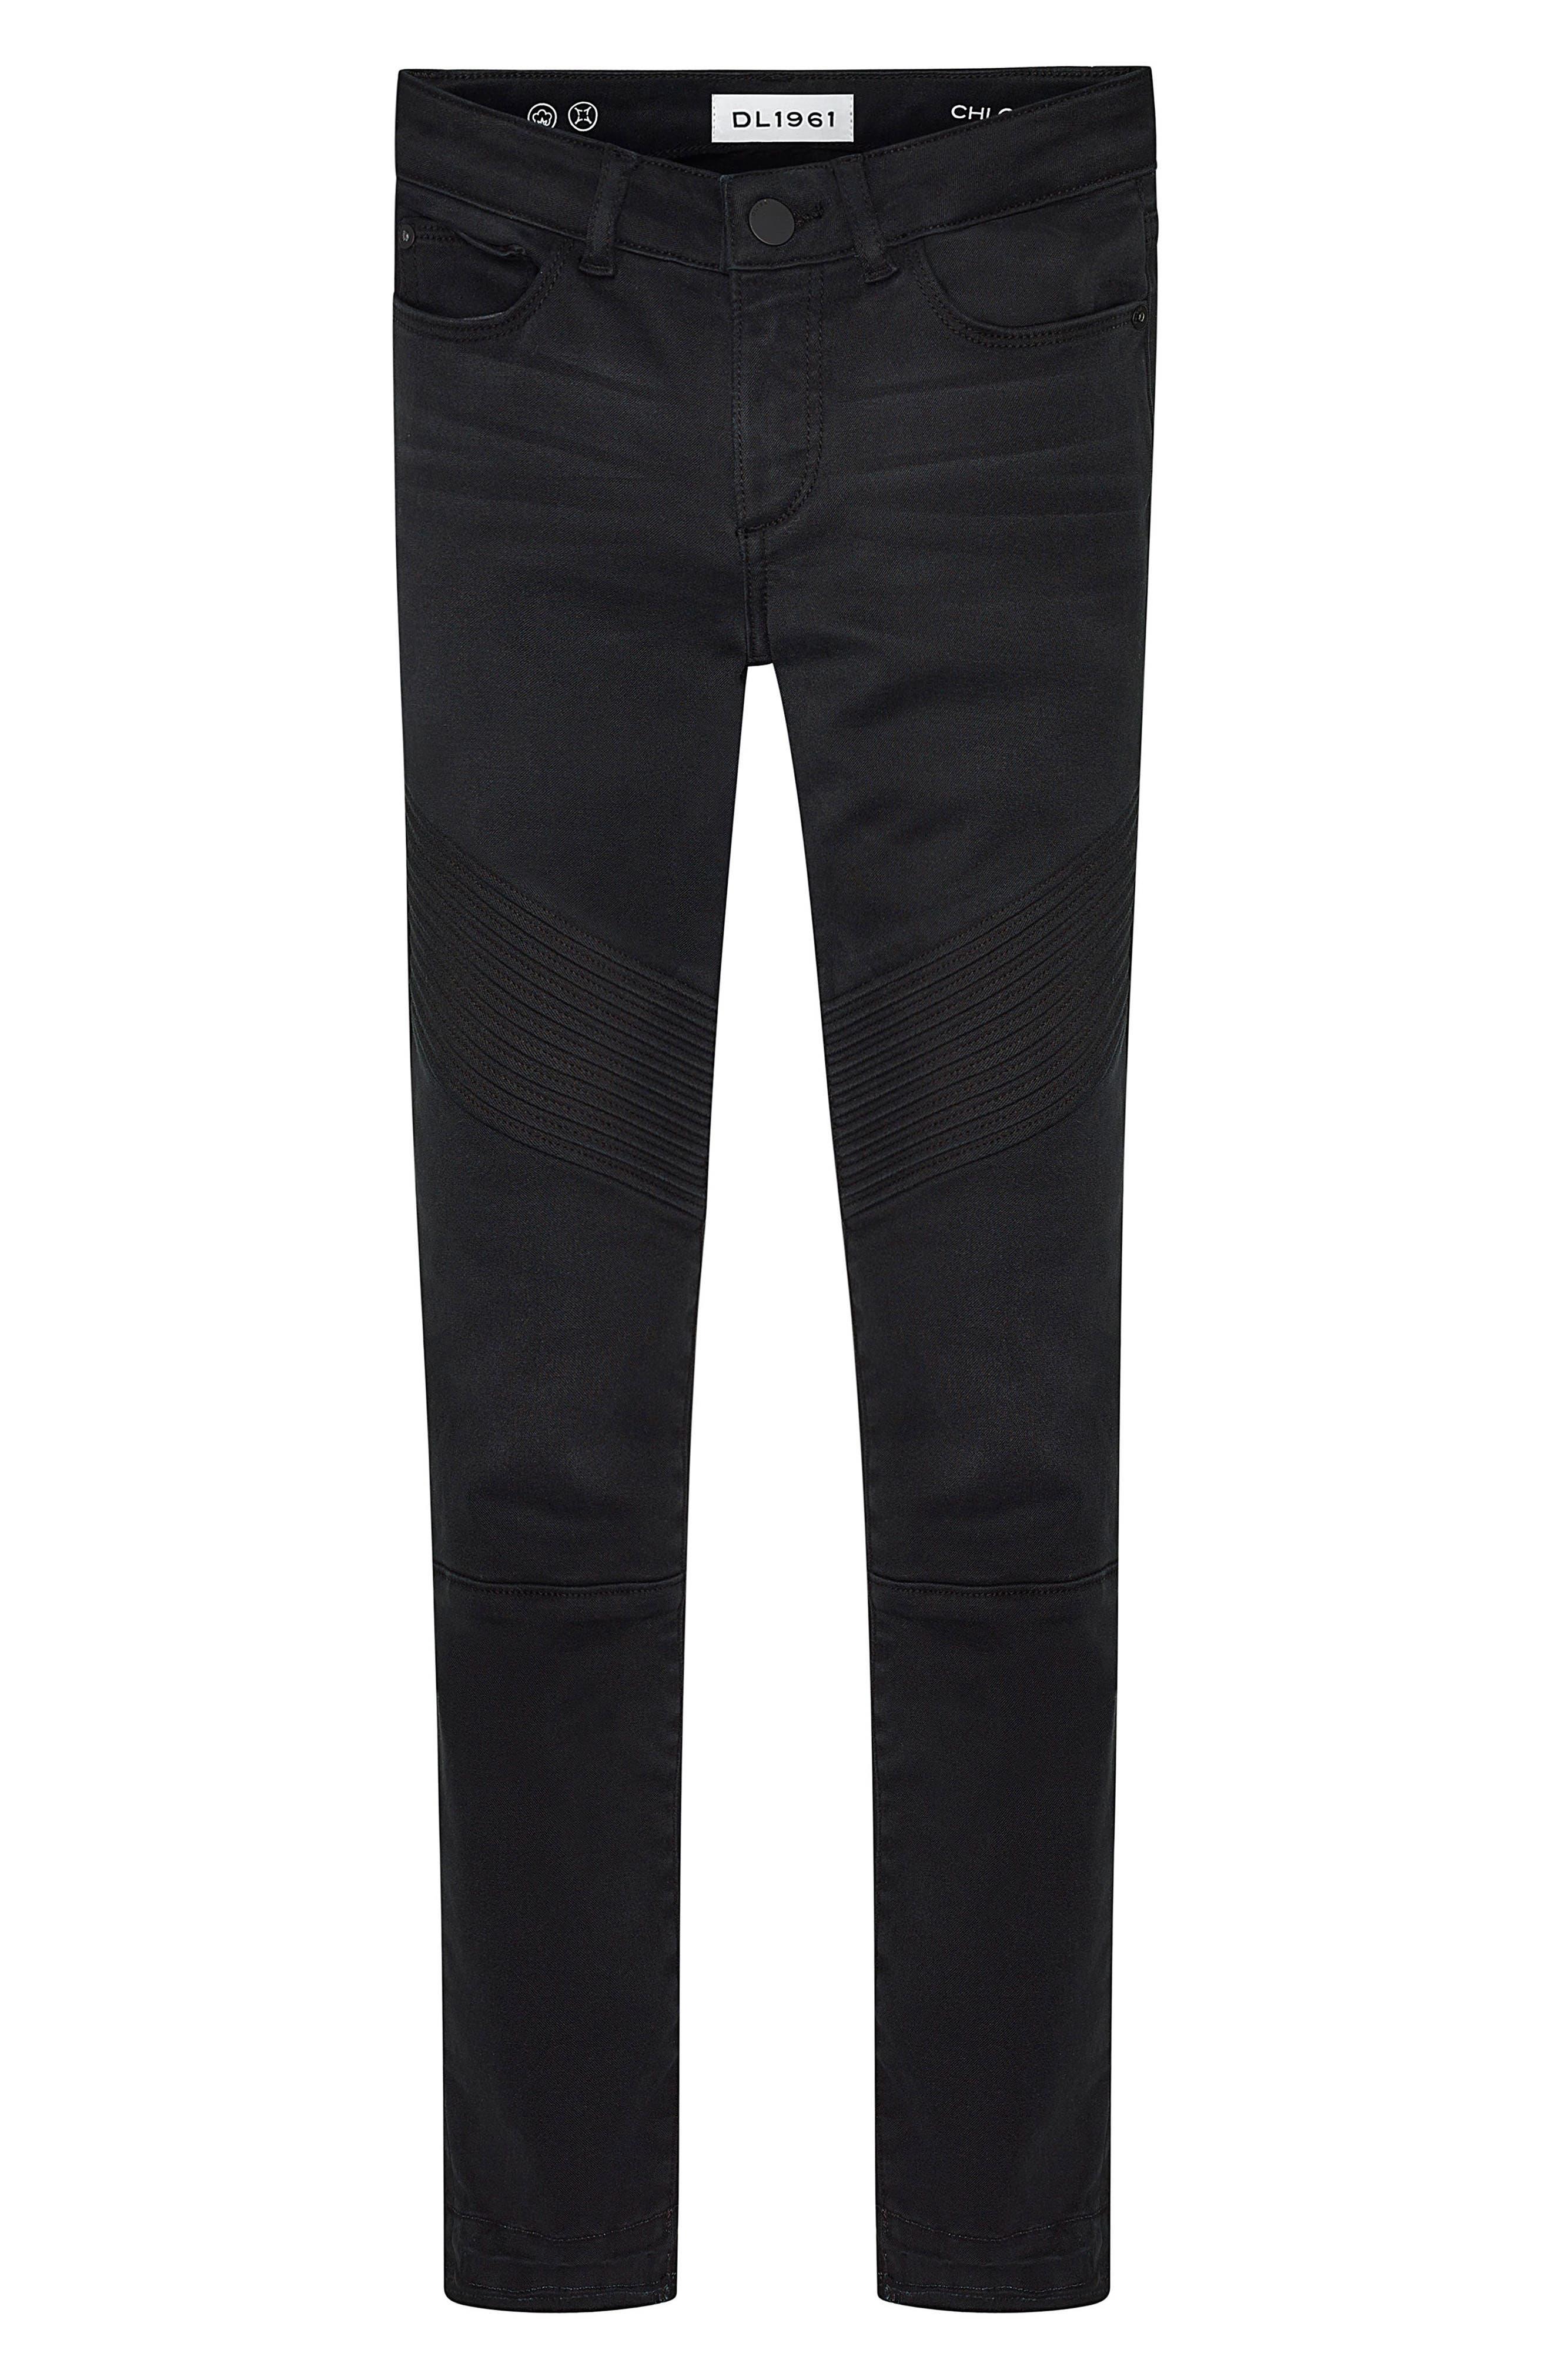 Moto Skinny Jeans,                         Main,                         color, Washed Black Moto